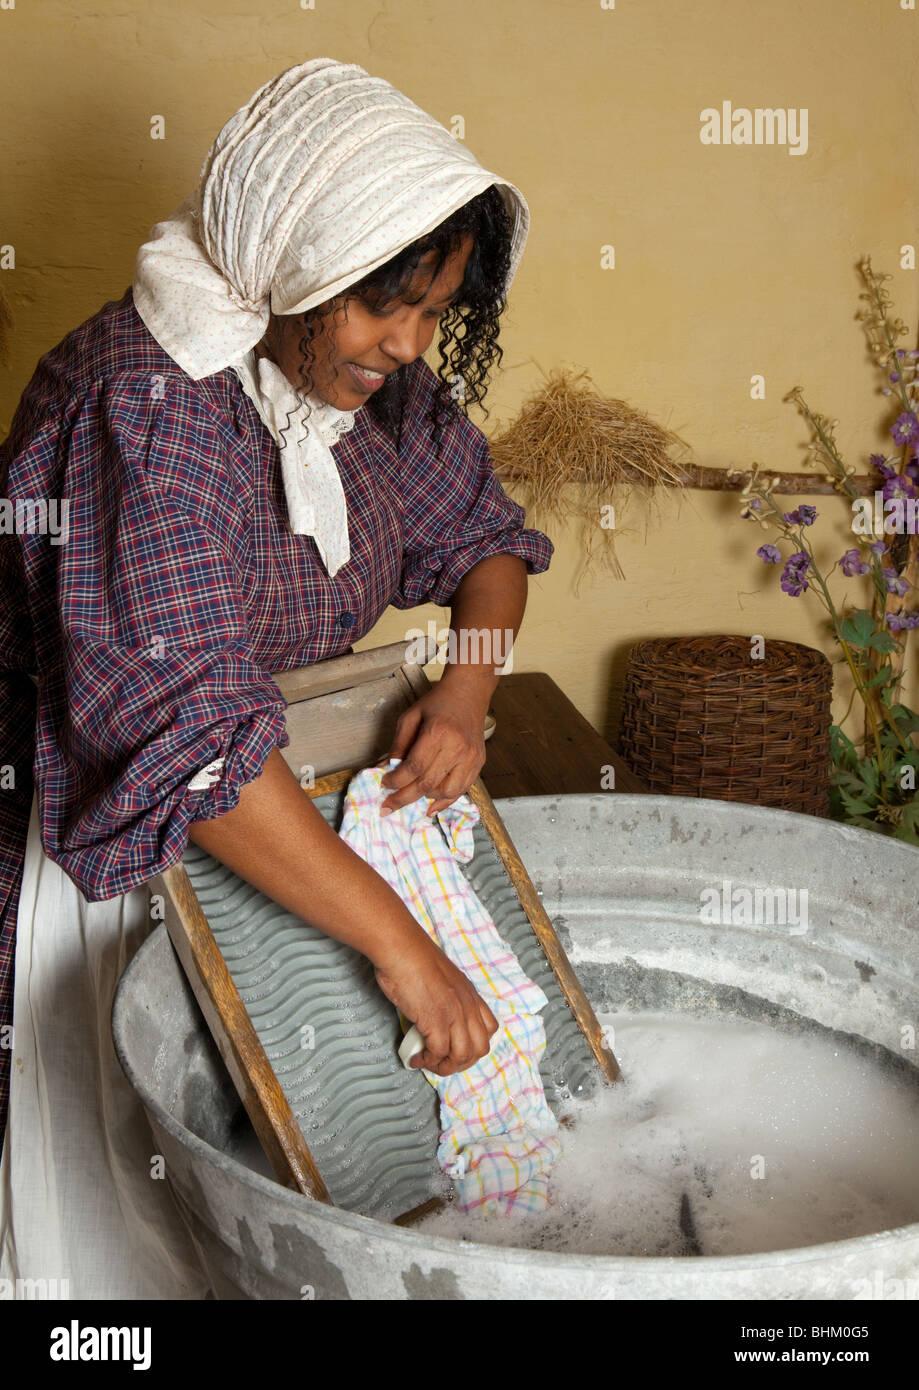 Old Fashioned Washing Soap